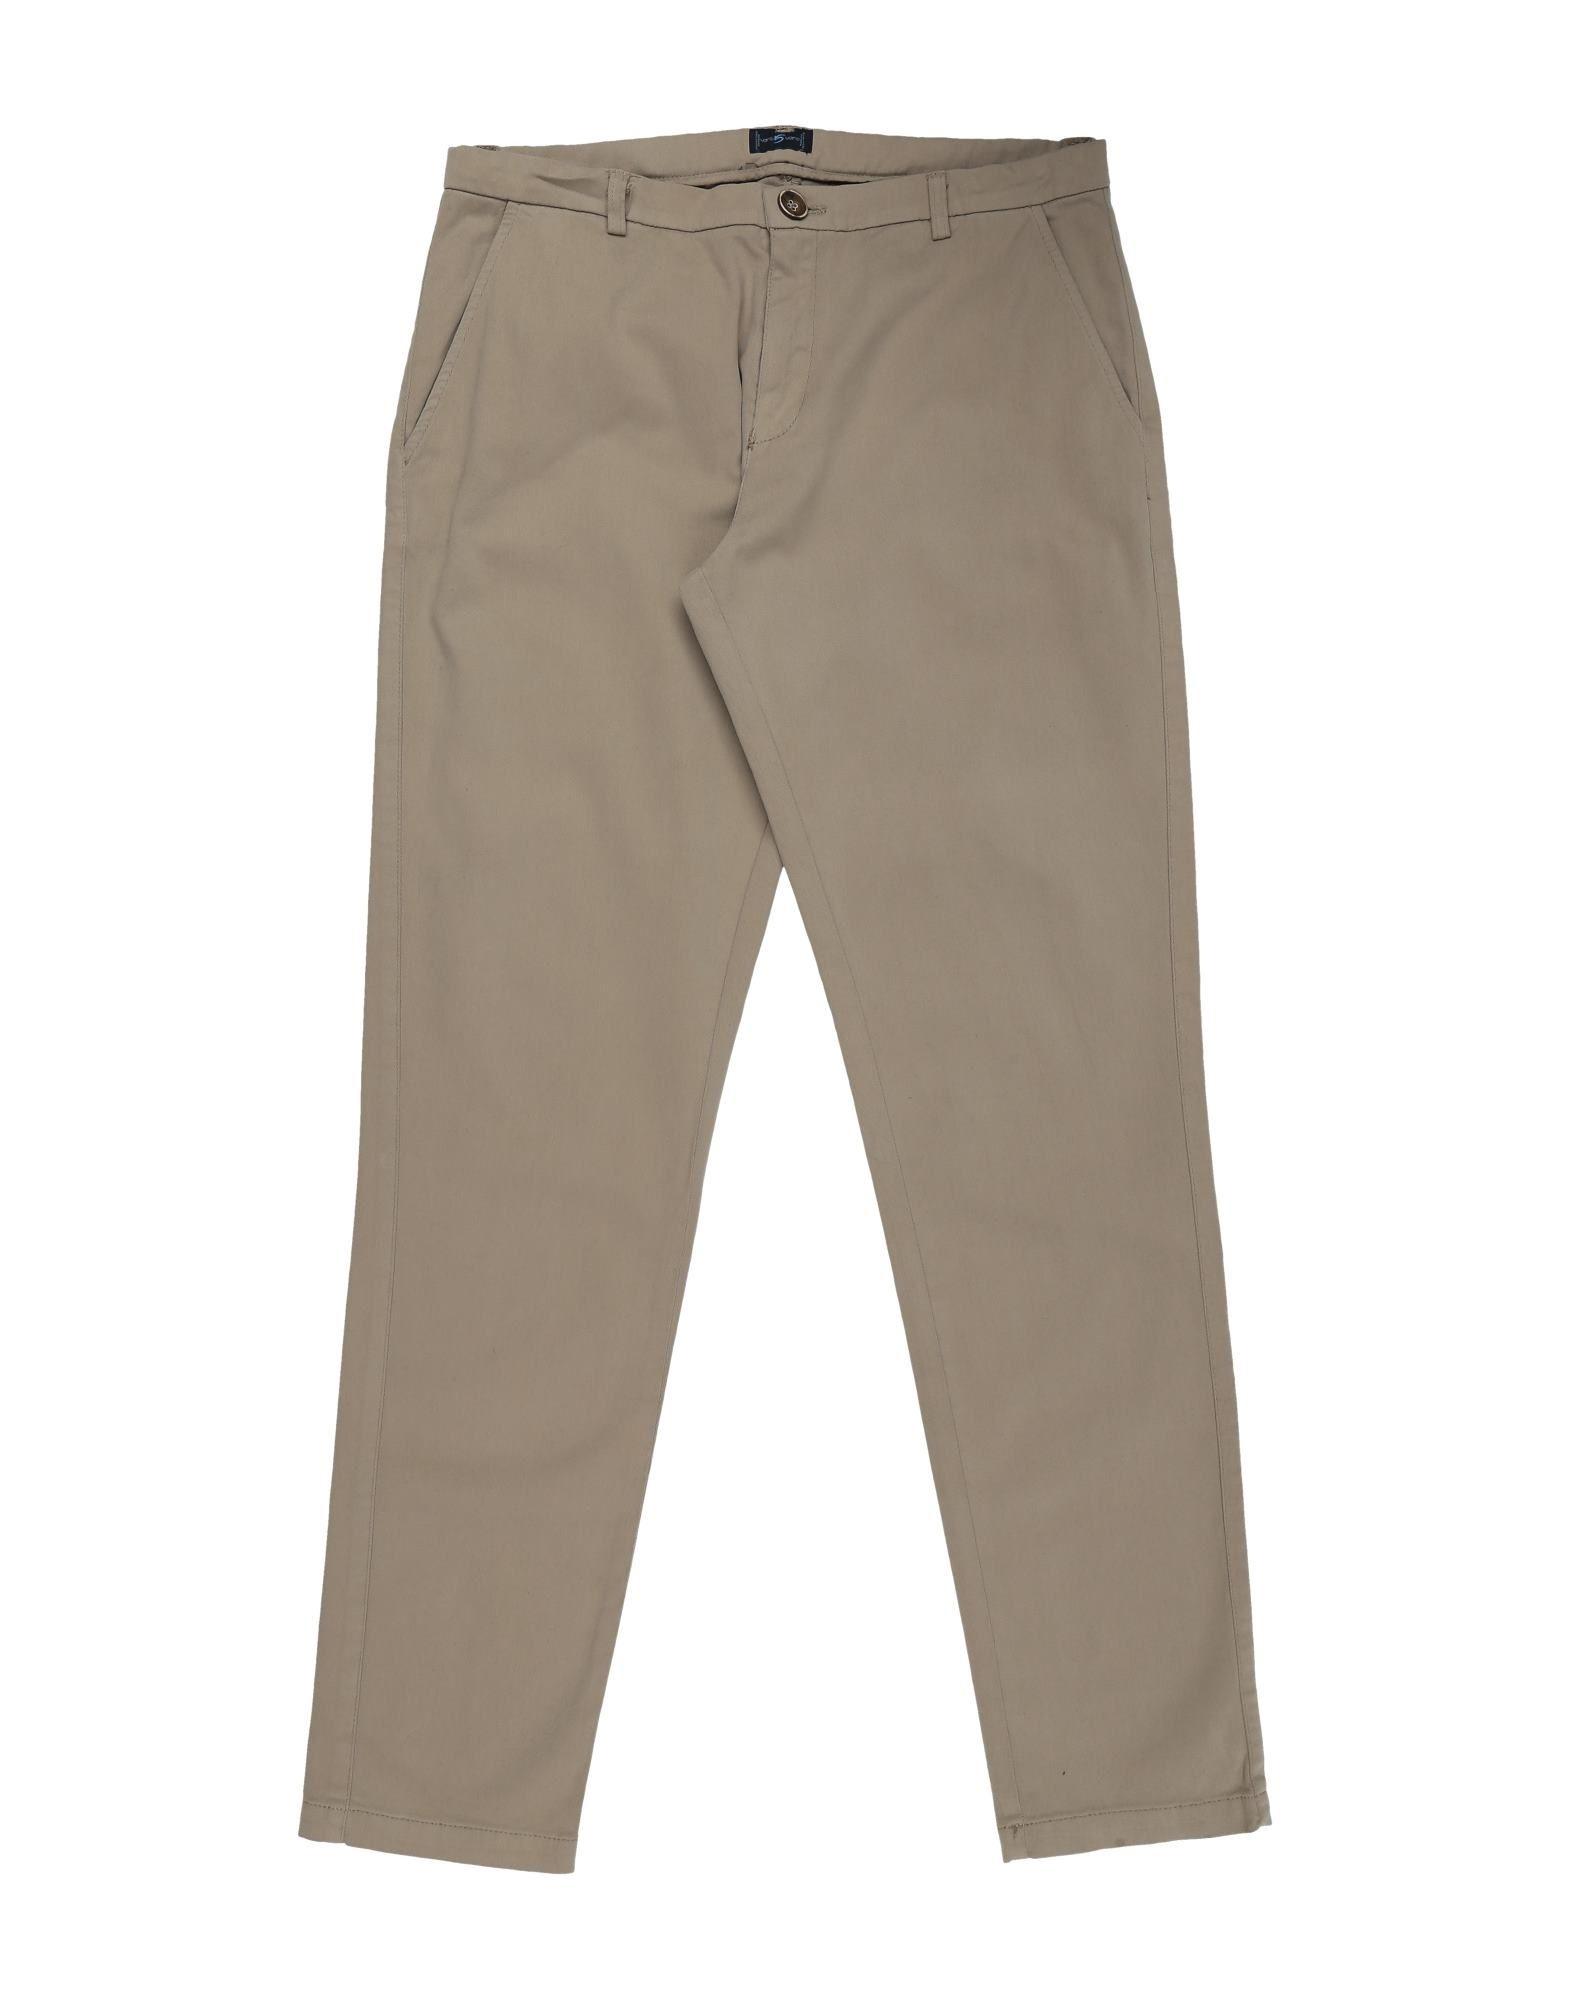 Varci Kids' Casual Pants In Neutrals